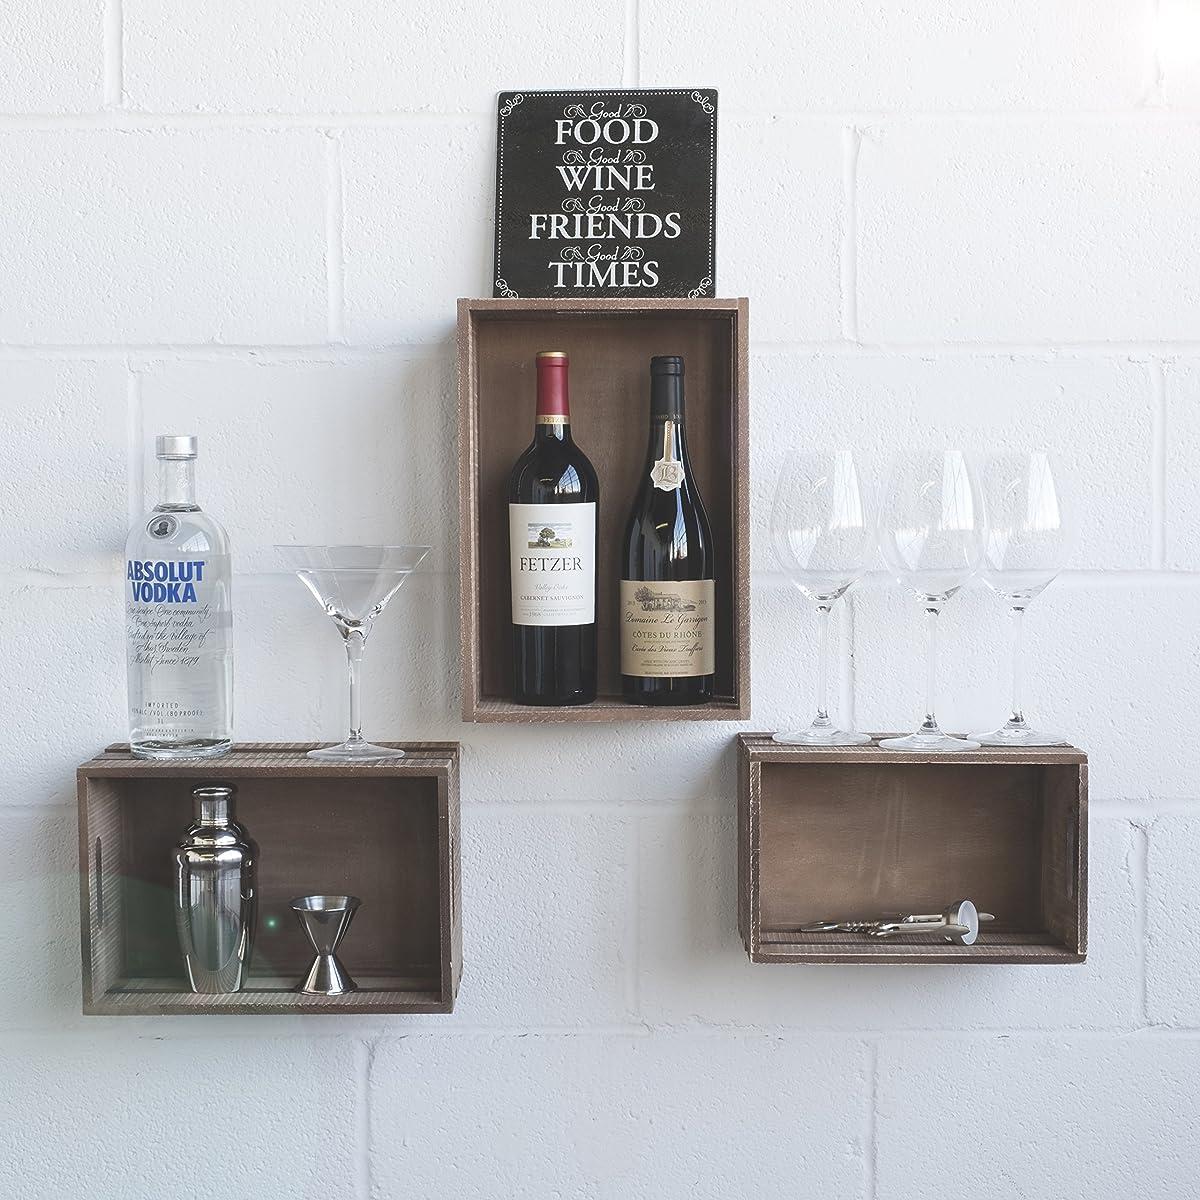 Wallniture Wall Mounted Shelves Crates - Durable Wood Floating Display Storage Bin Organizer With Handles Set of 3 , Walnut